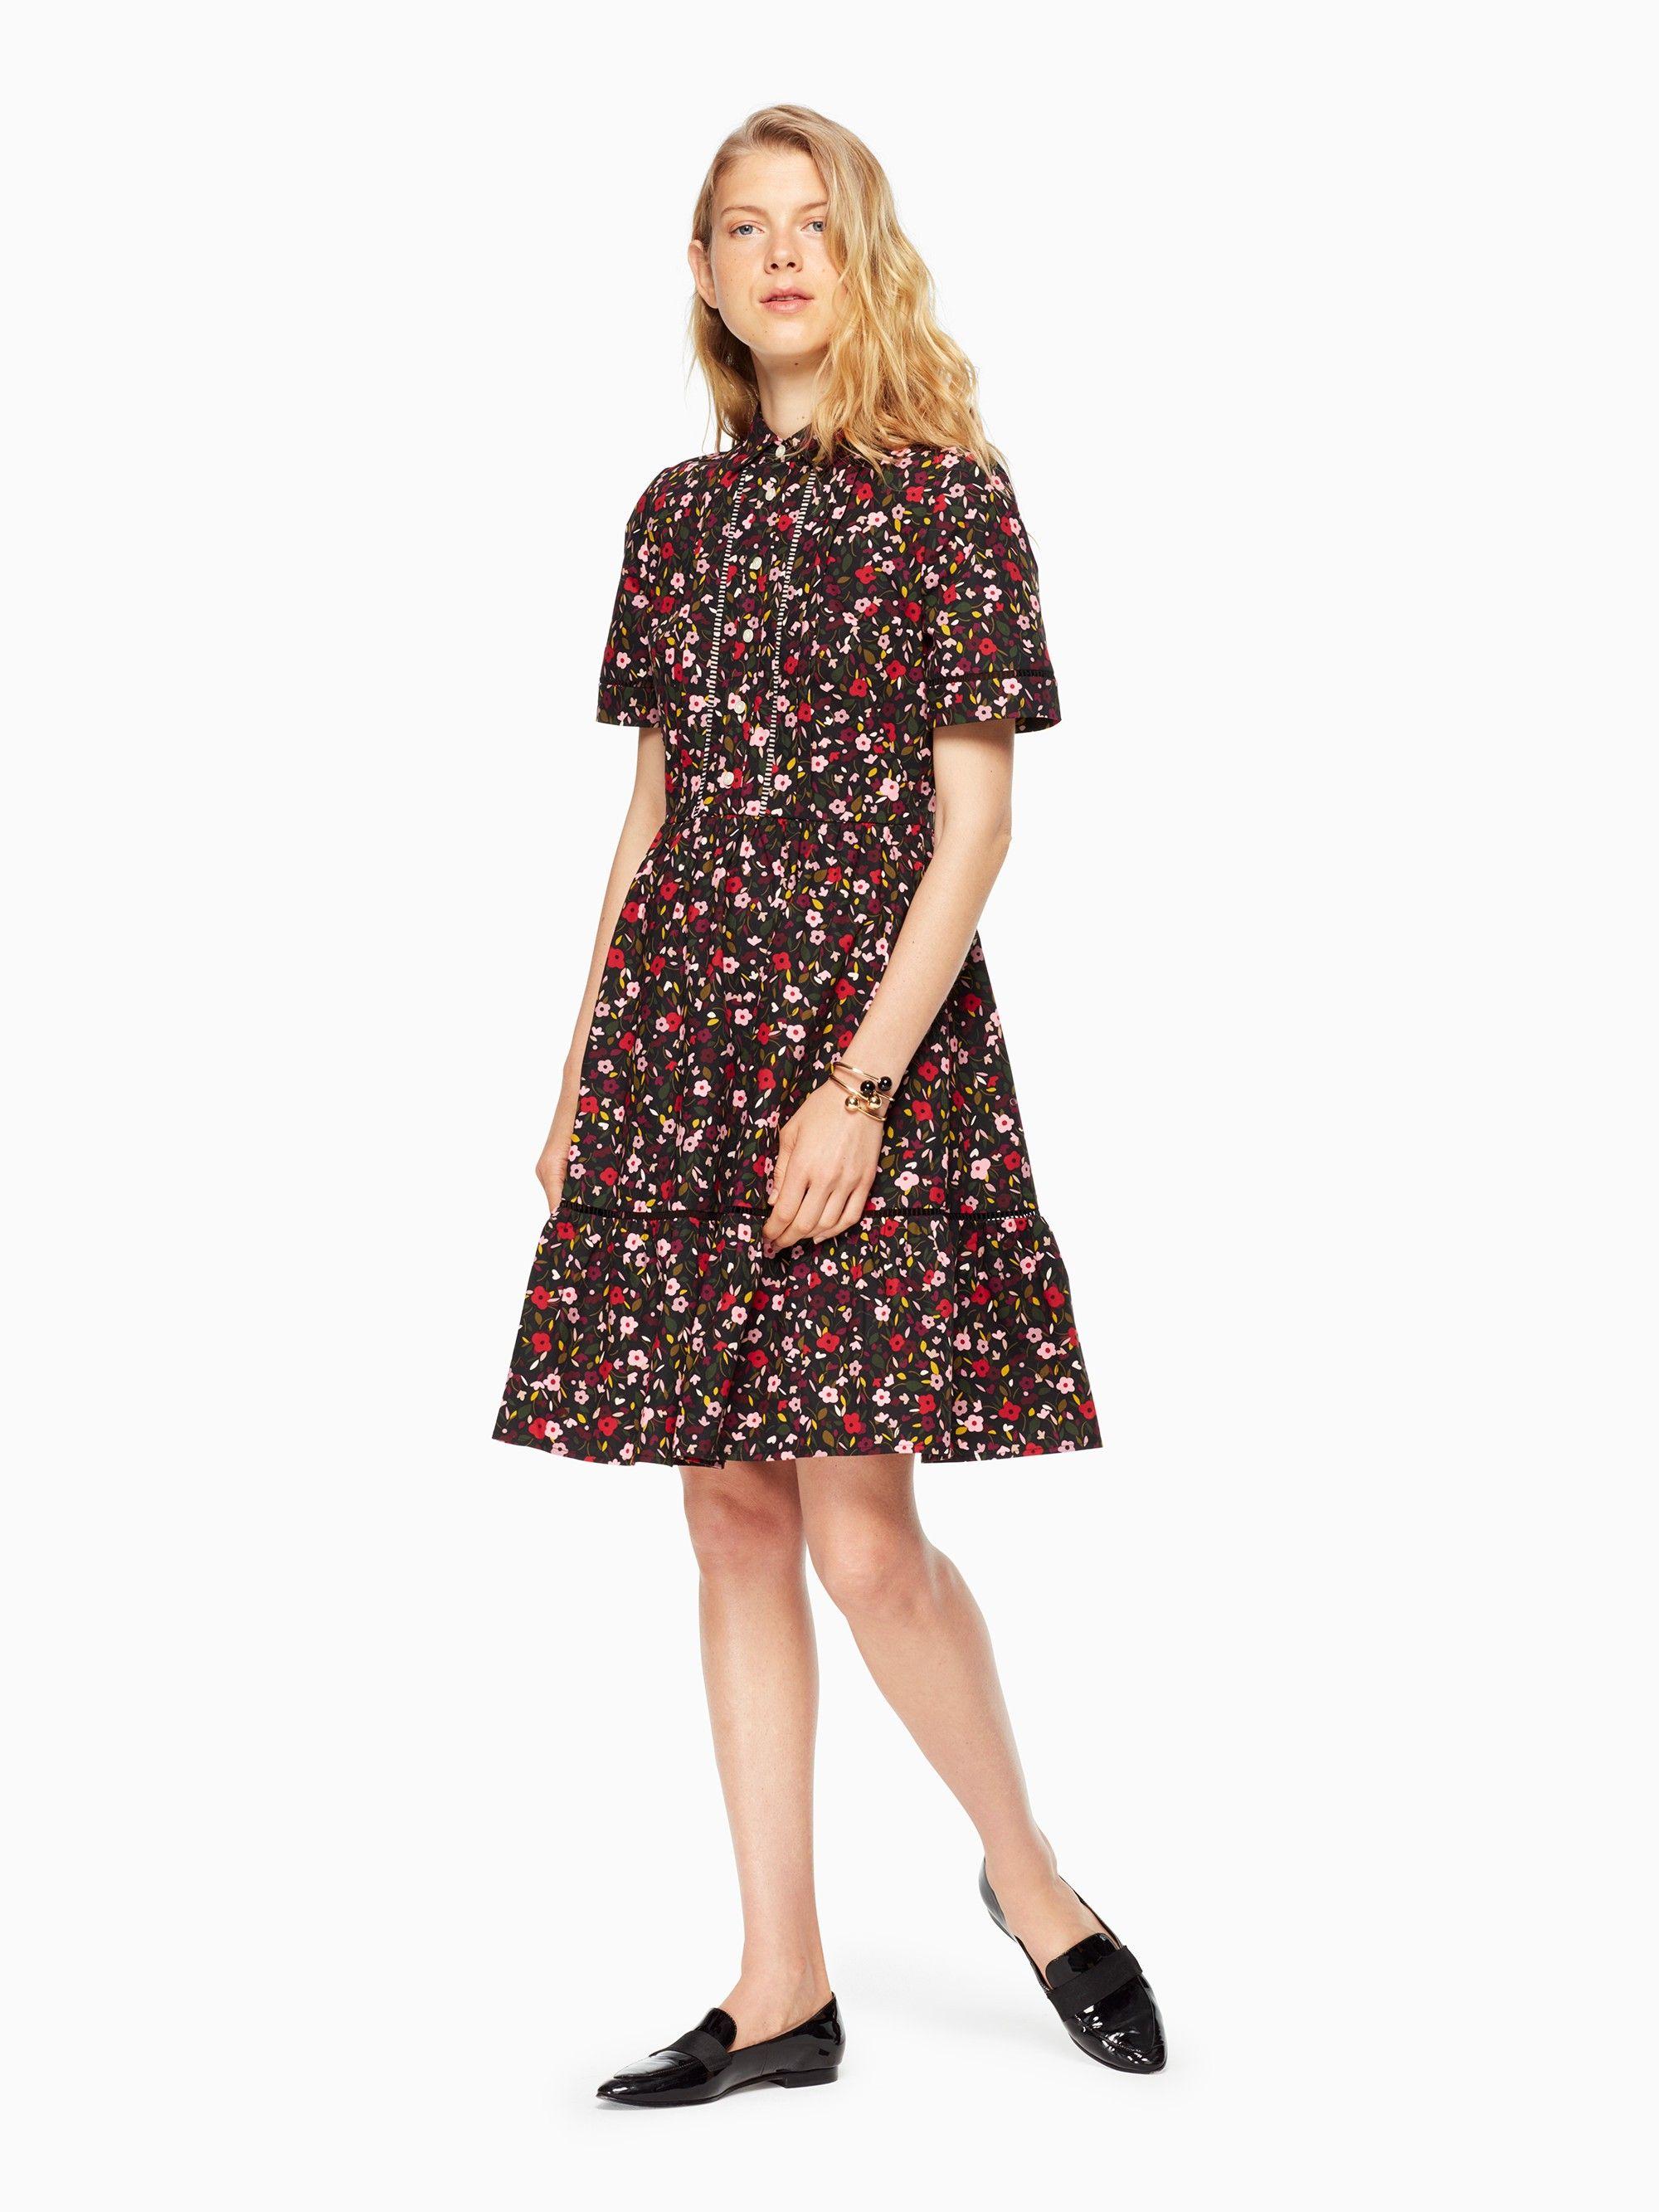 efb370f66cb KATE SPADE boho floral shirtdress.  katespade  cloth